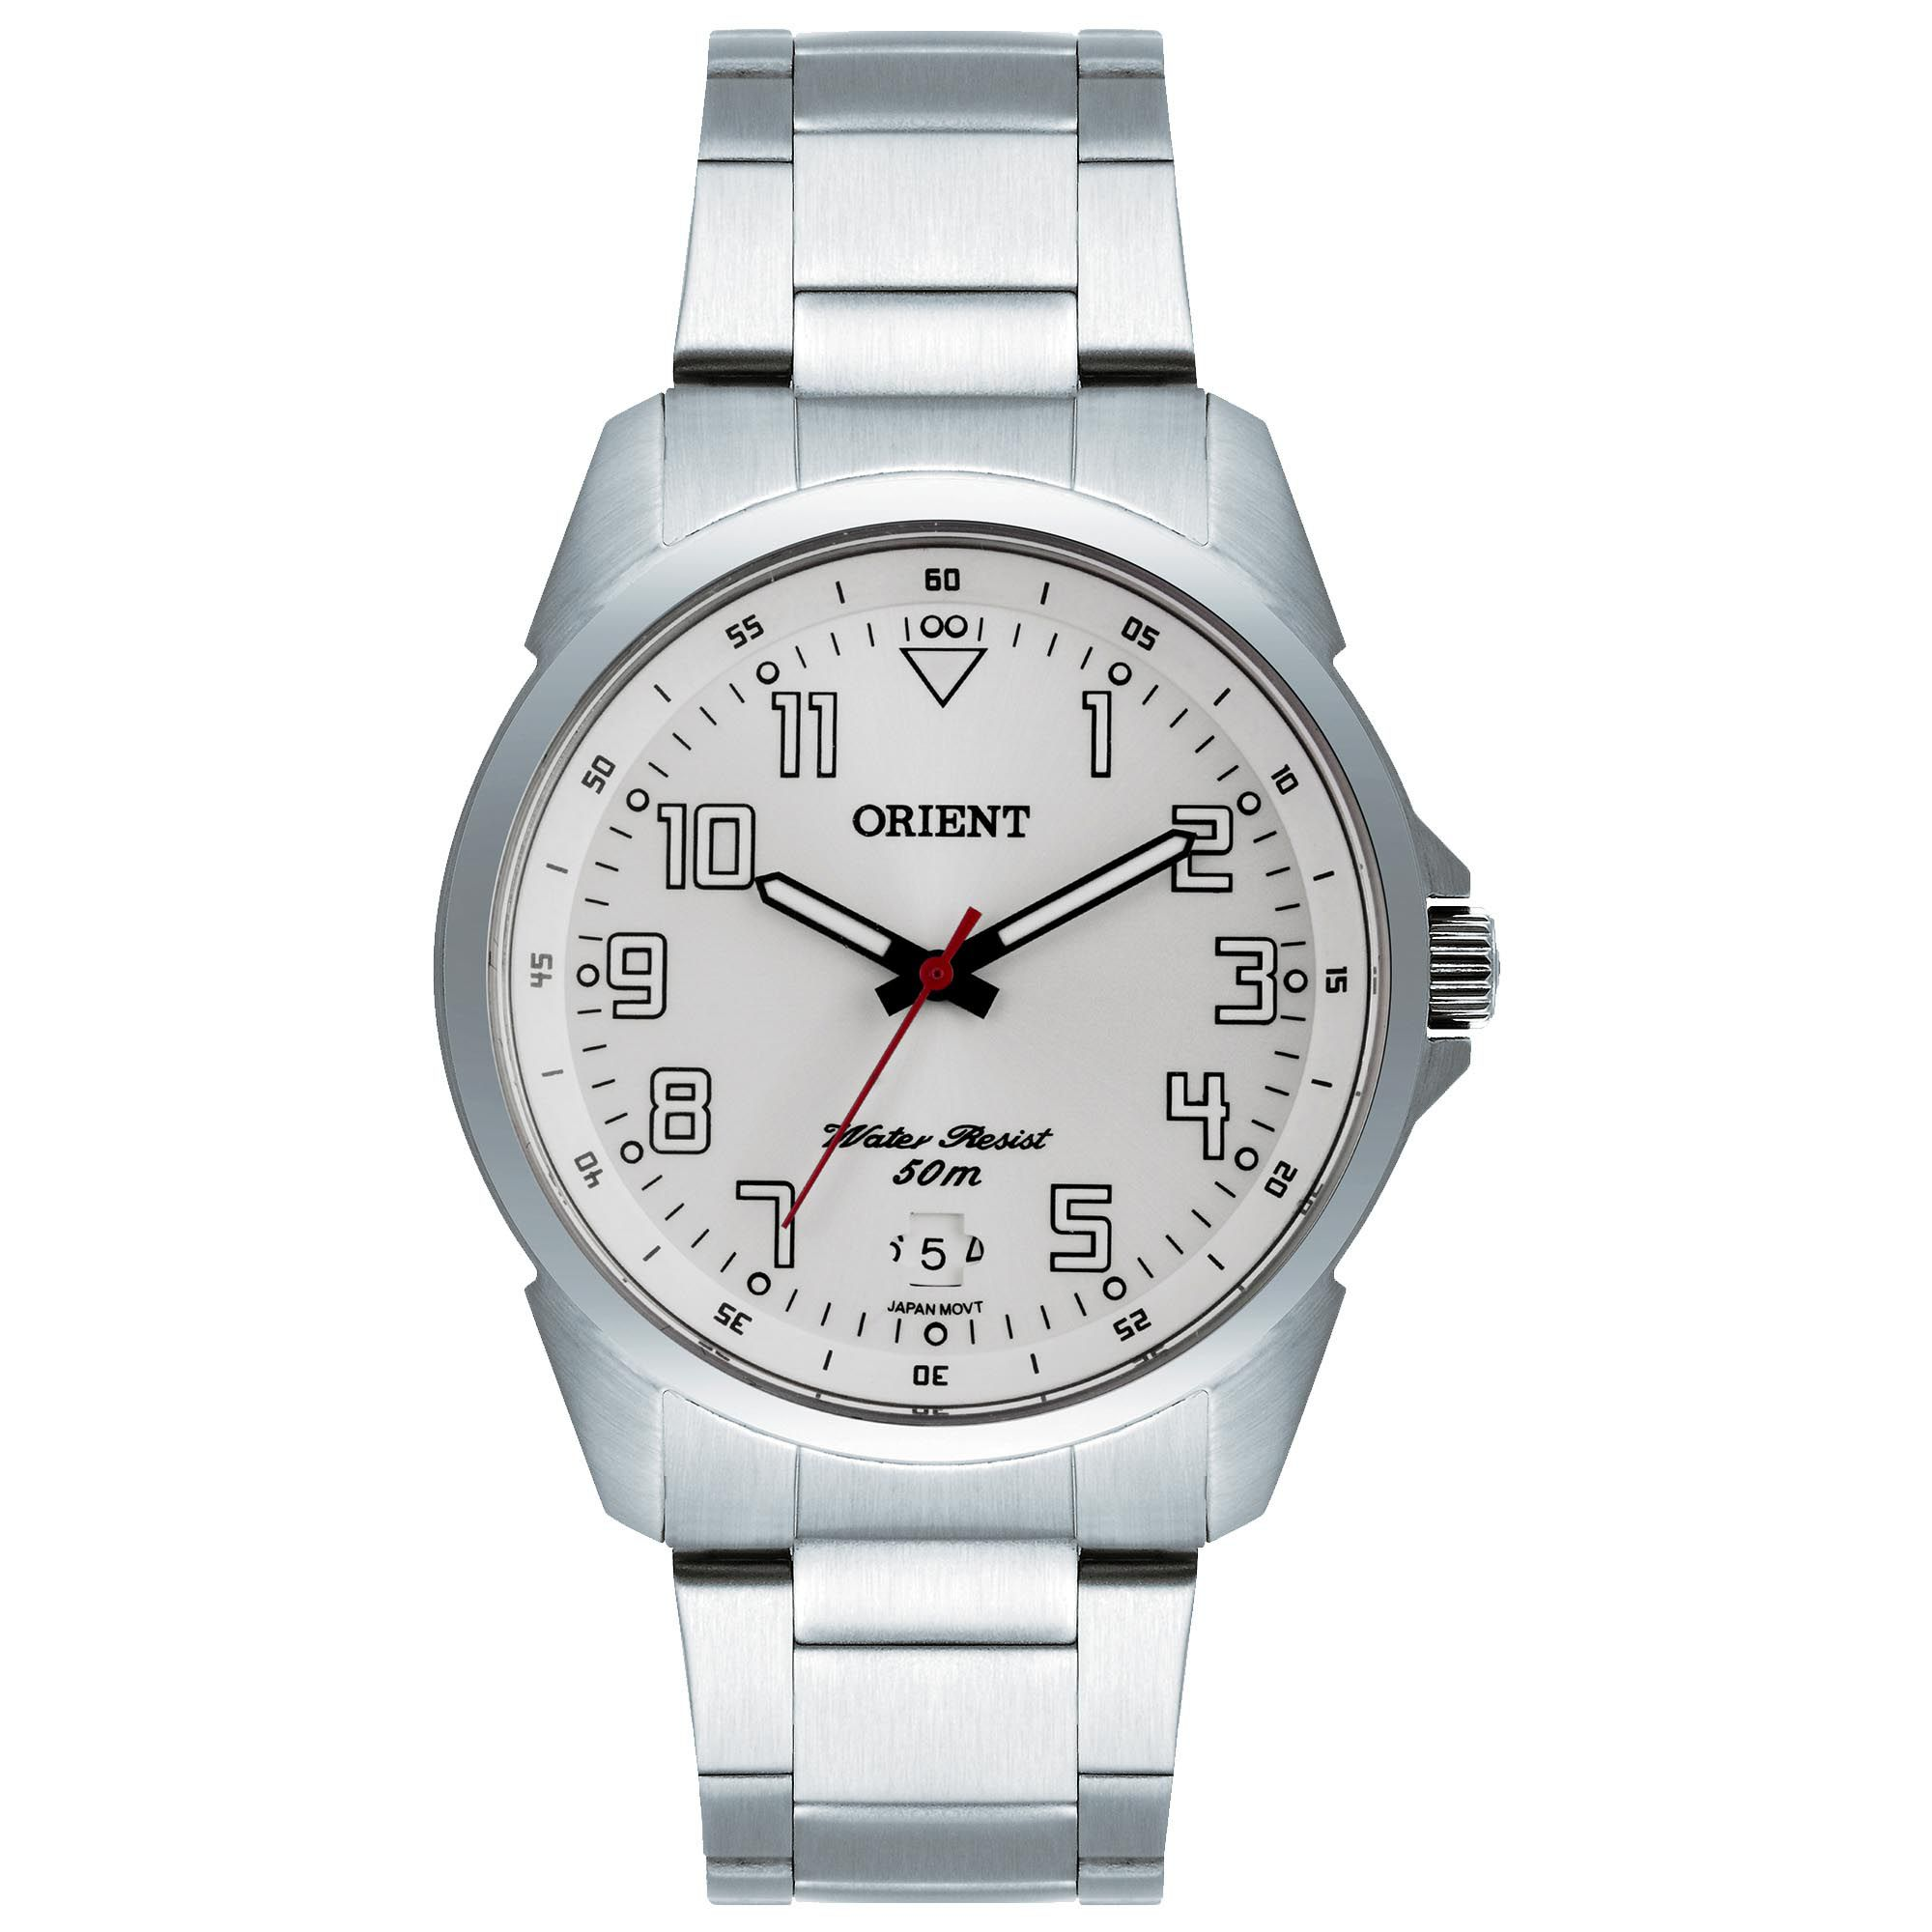 Relógio Masculino Orient MBSS1154 S2SX